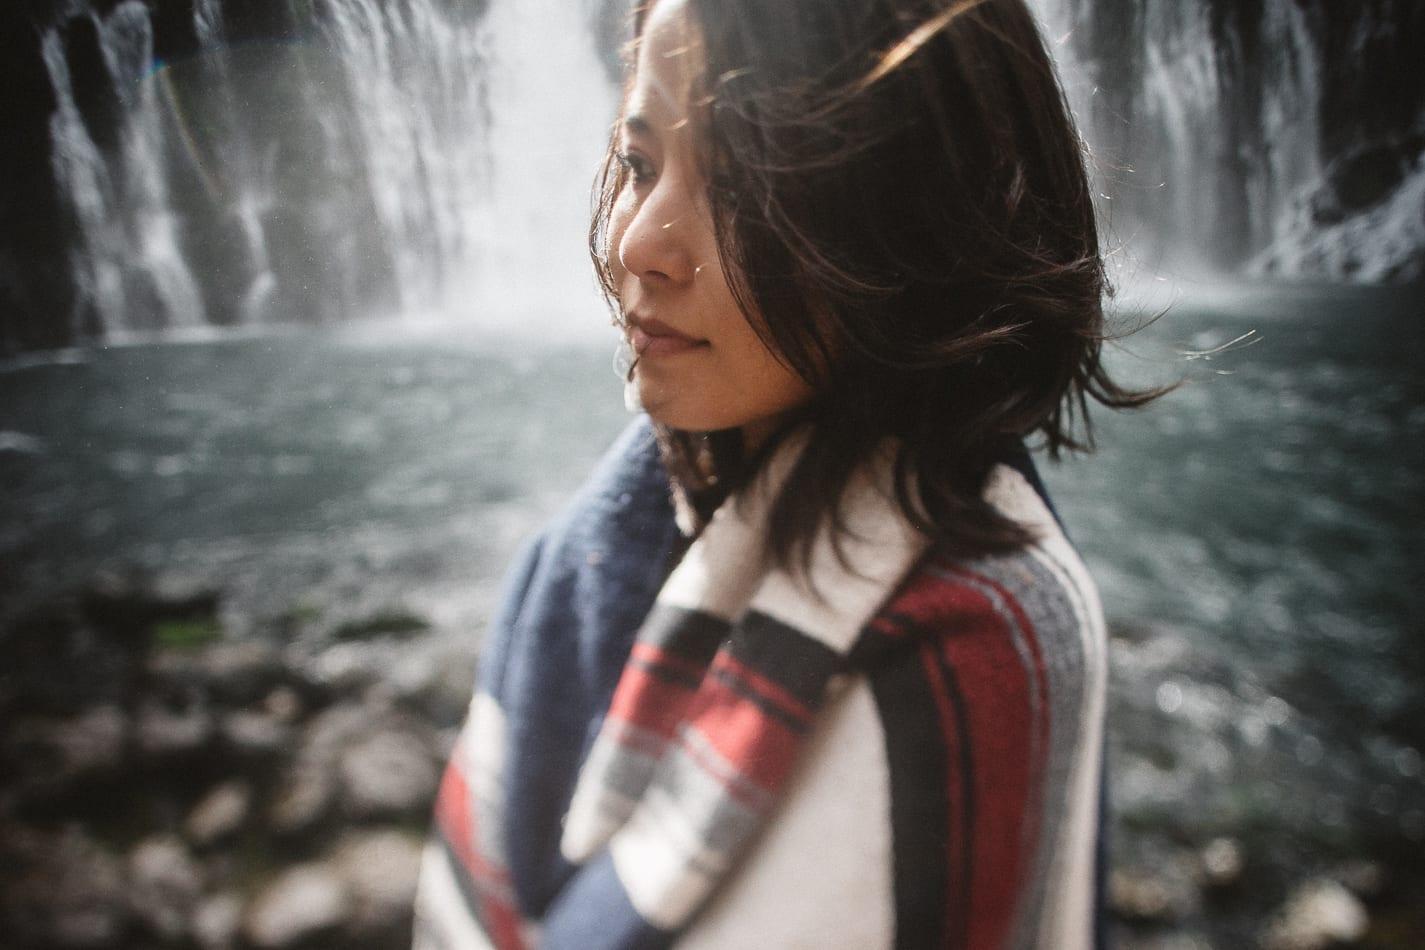 burney-falls-lifestyle-portrait-photographer-10